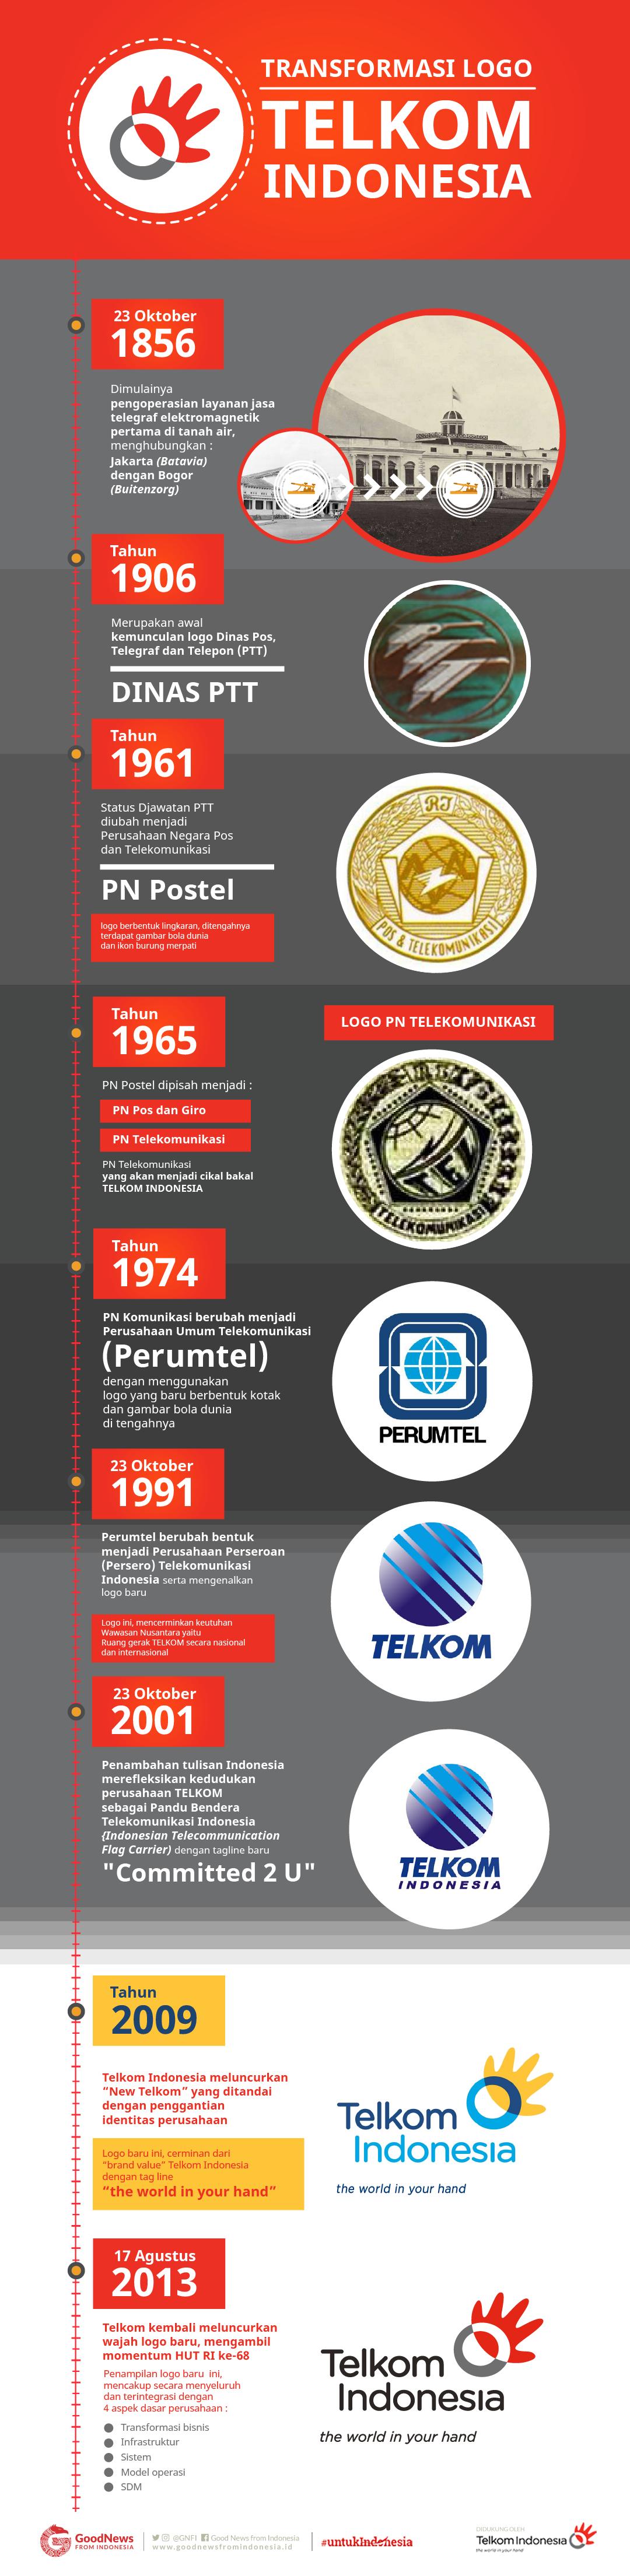 Transformasi Logo Telkom Indonesia